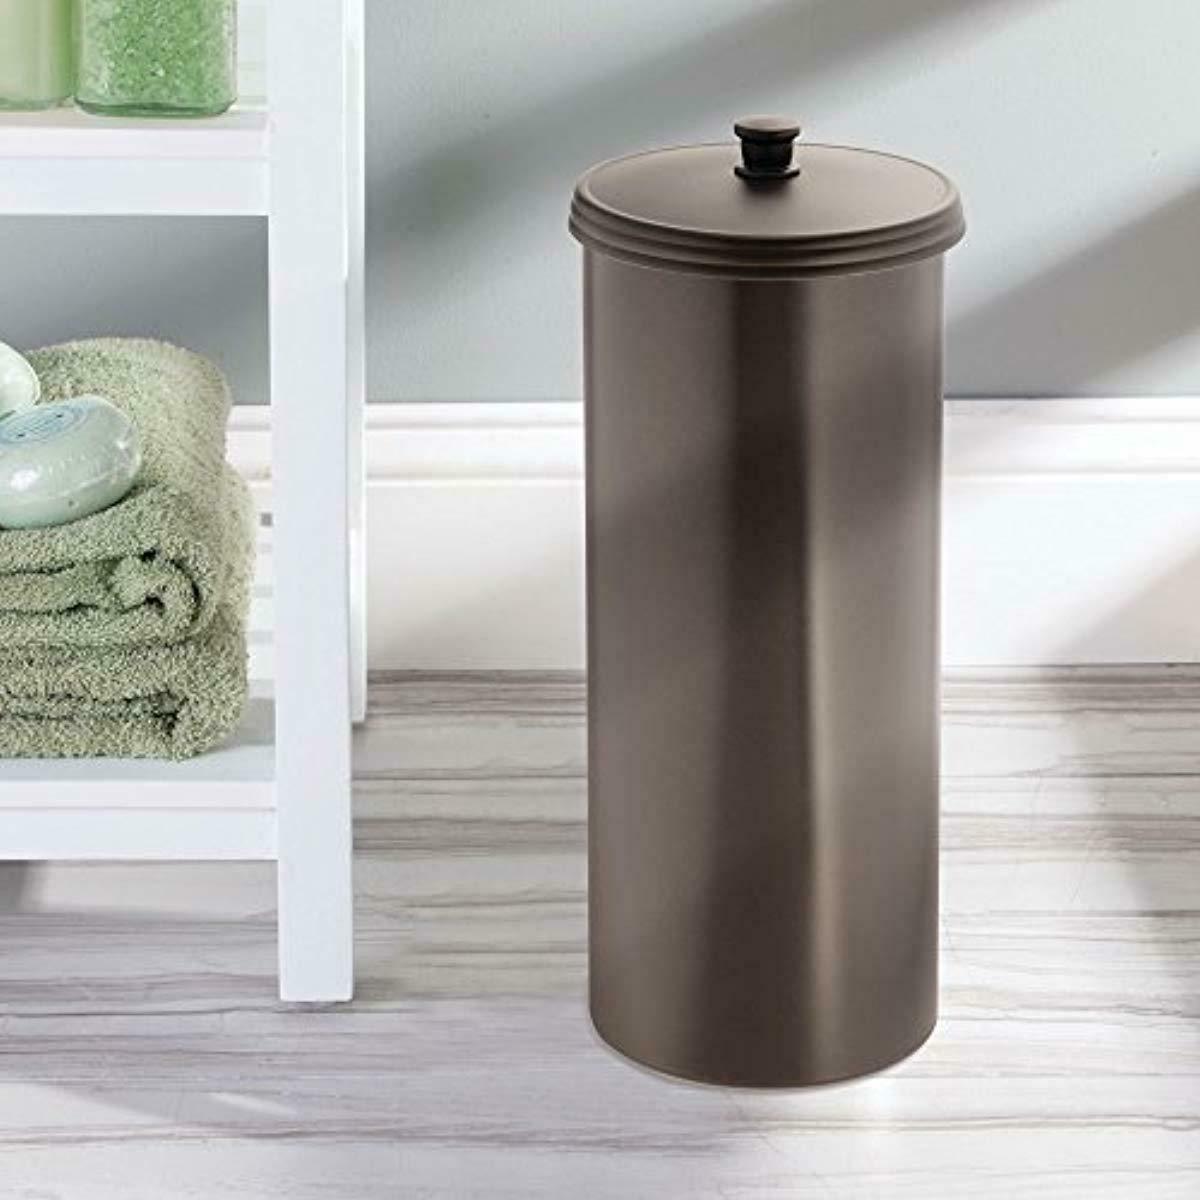 iDesign Kent Toilet Tissue Roll Vertical Free